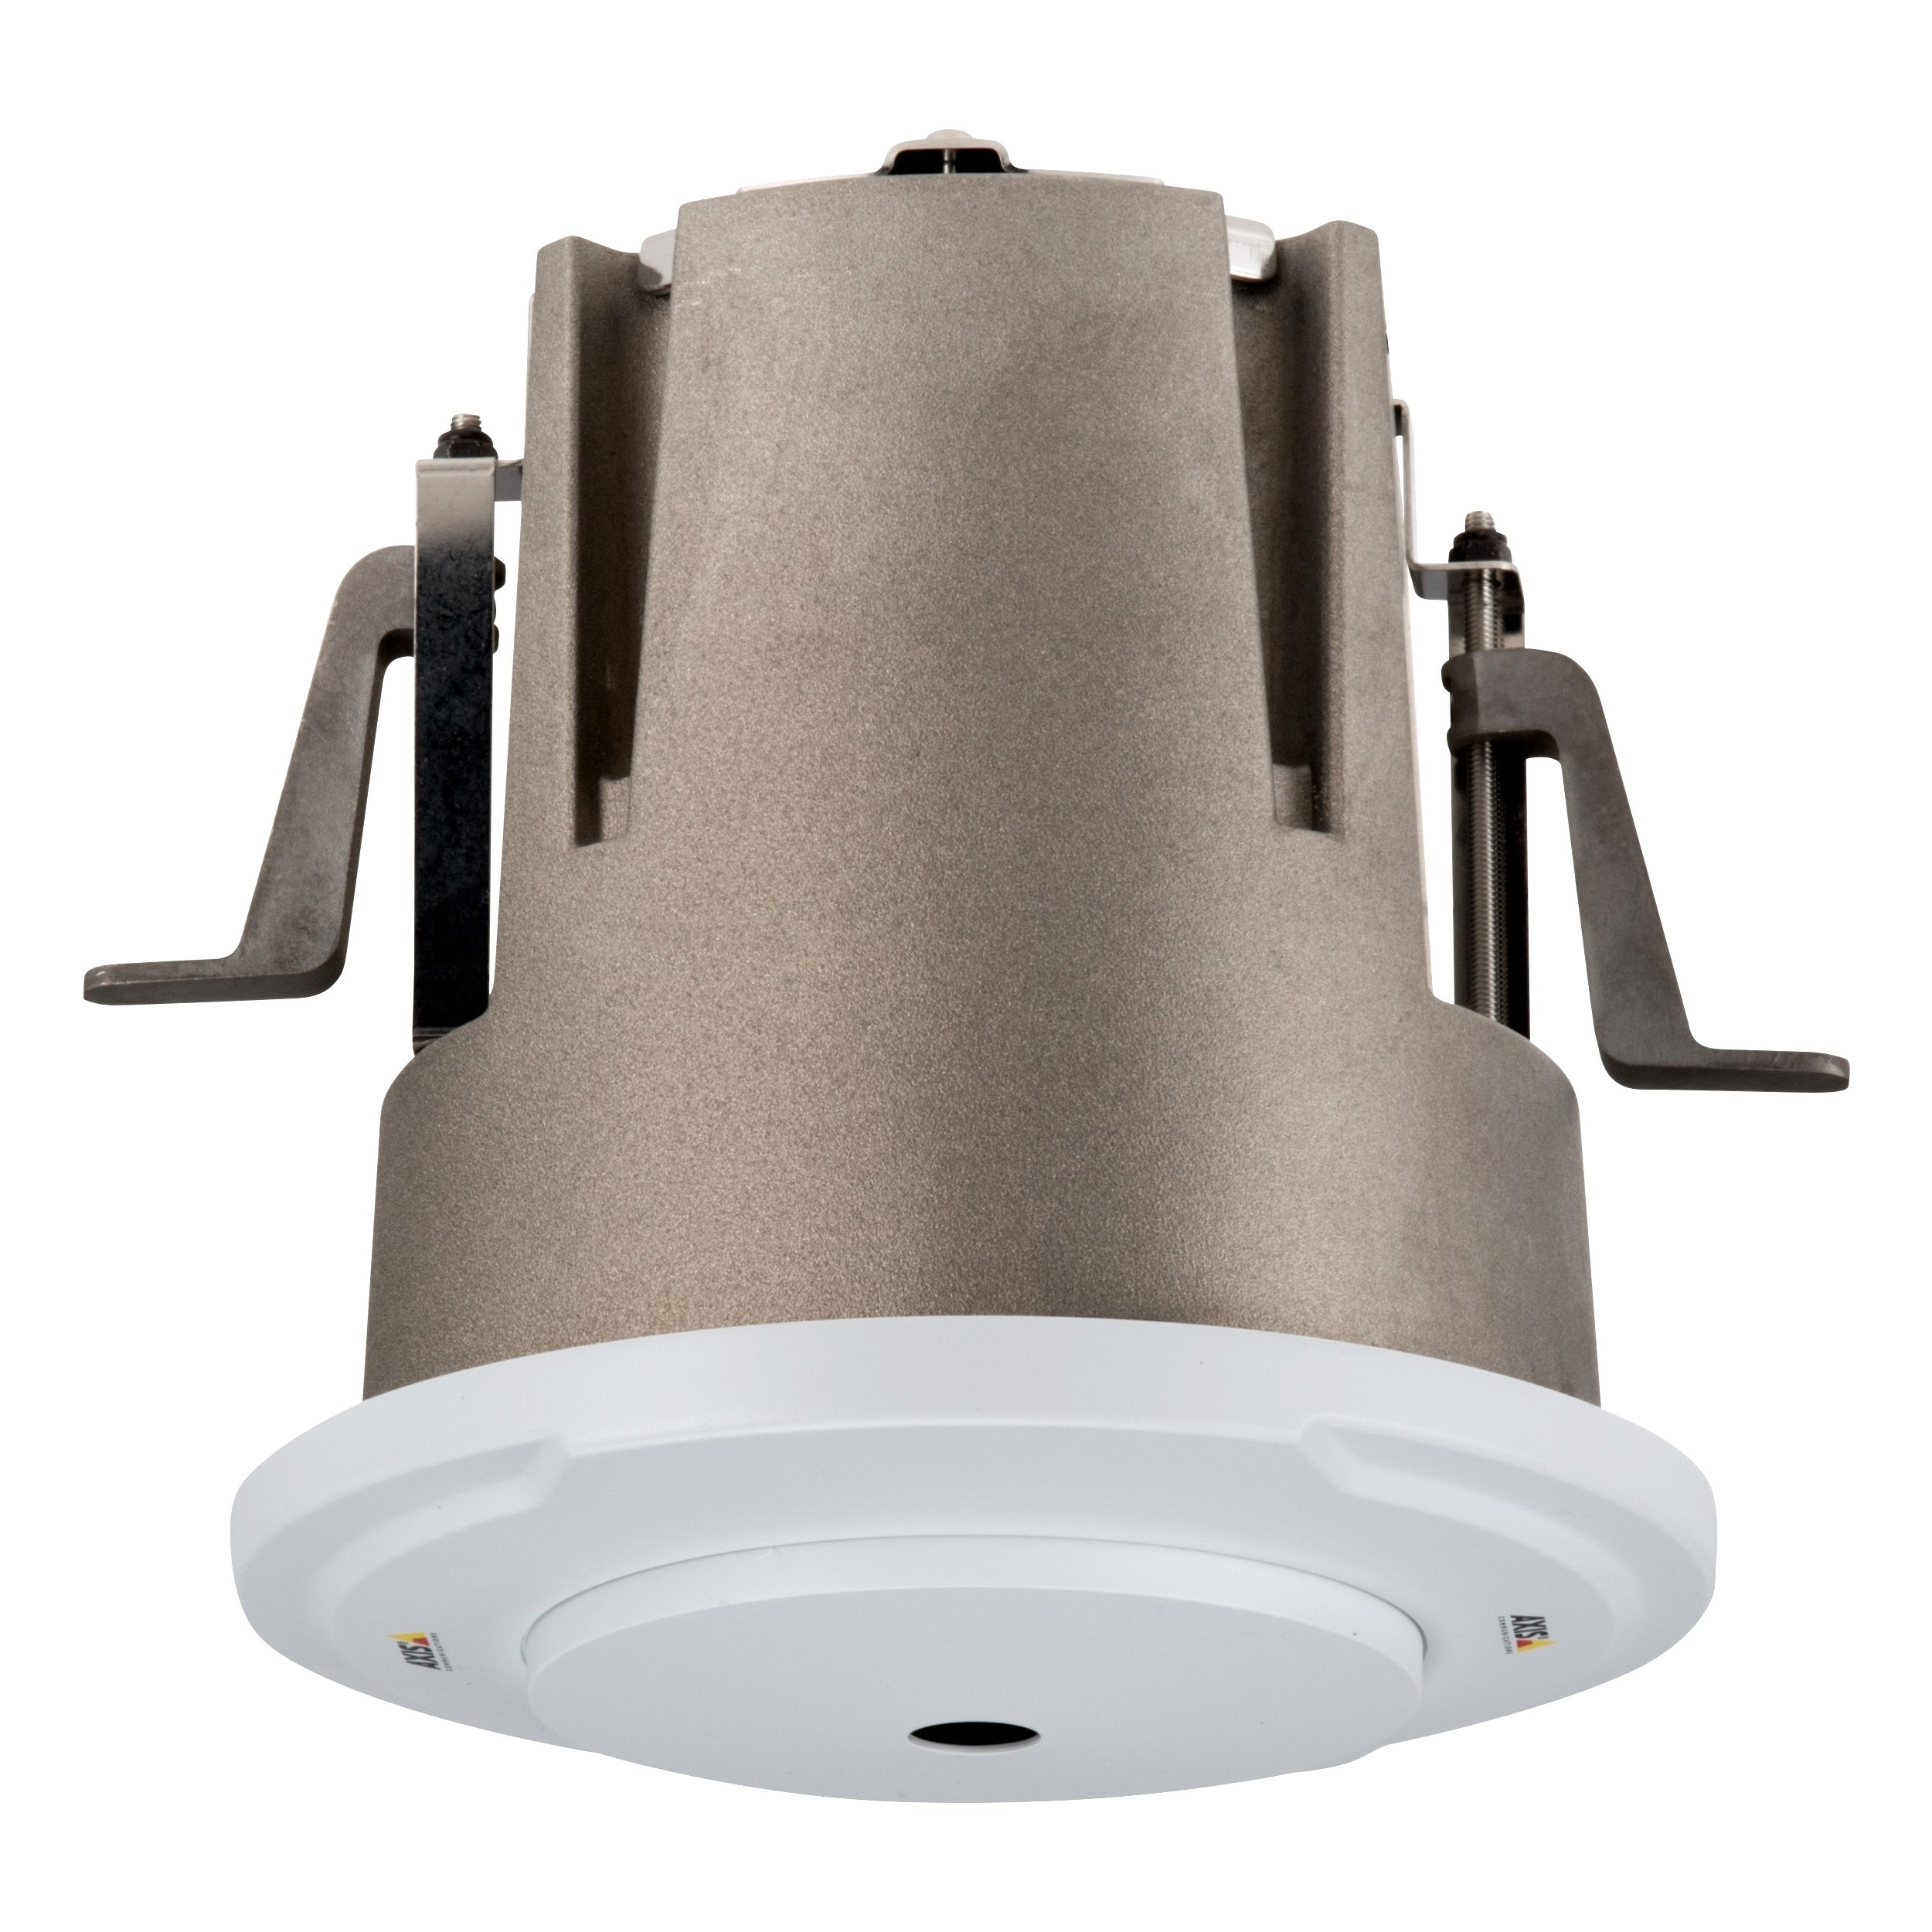 Axis 5504-871 T94f02l Recessed Mount Indoor Mnt Recessd M...